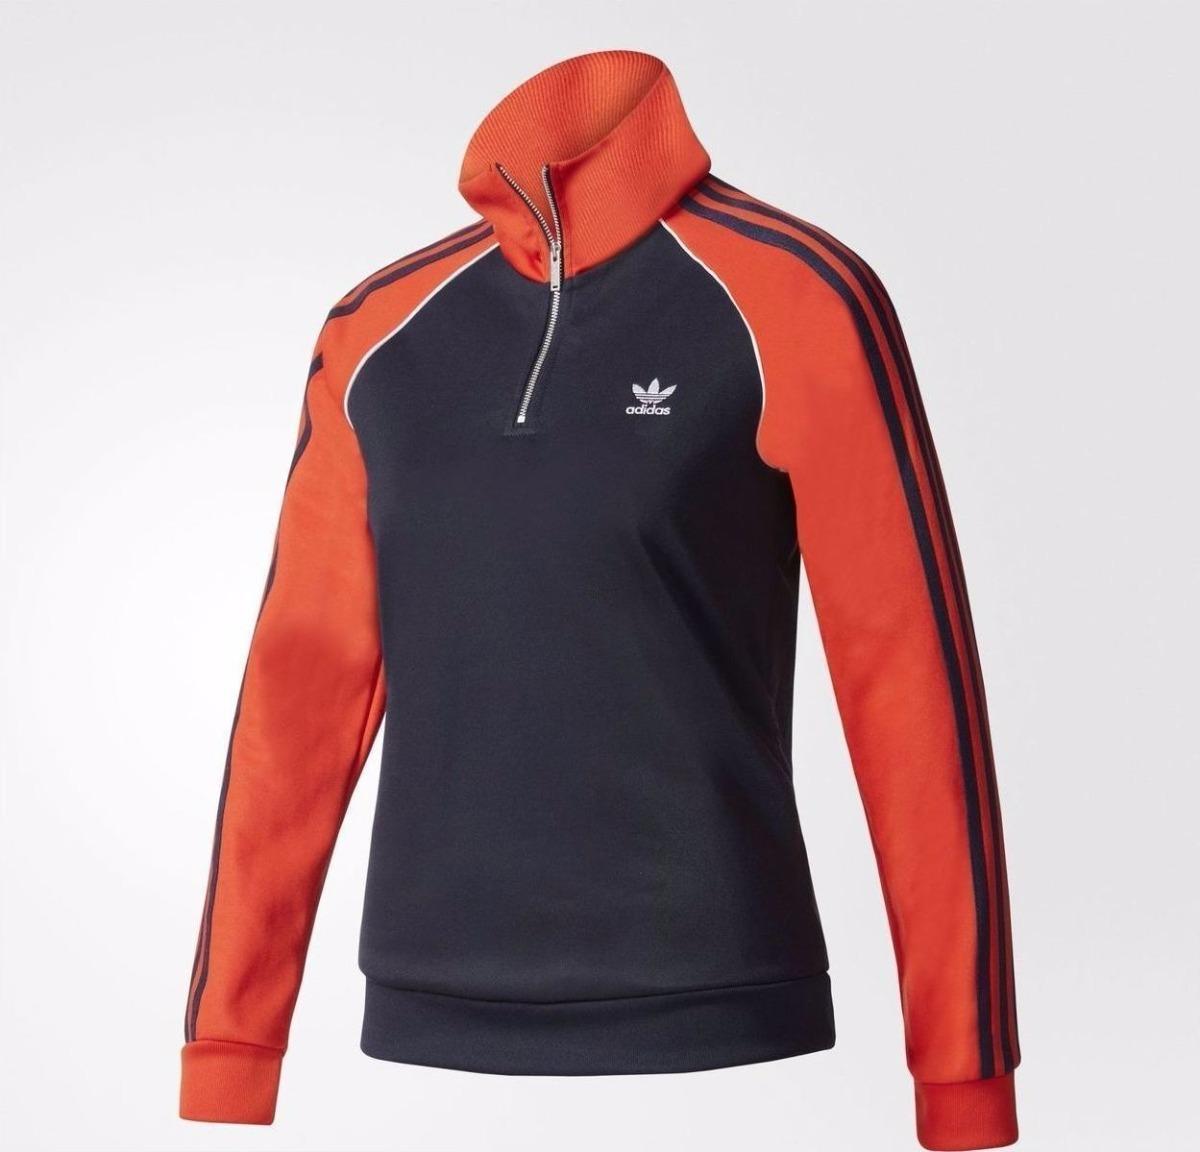 e224b6686f4 jaqueta adidas feminina track jacket. Carregando zoom.